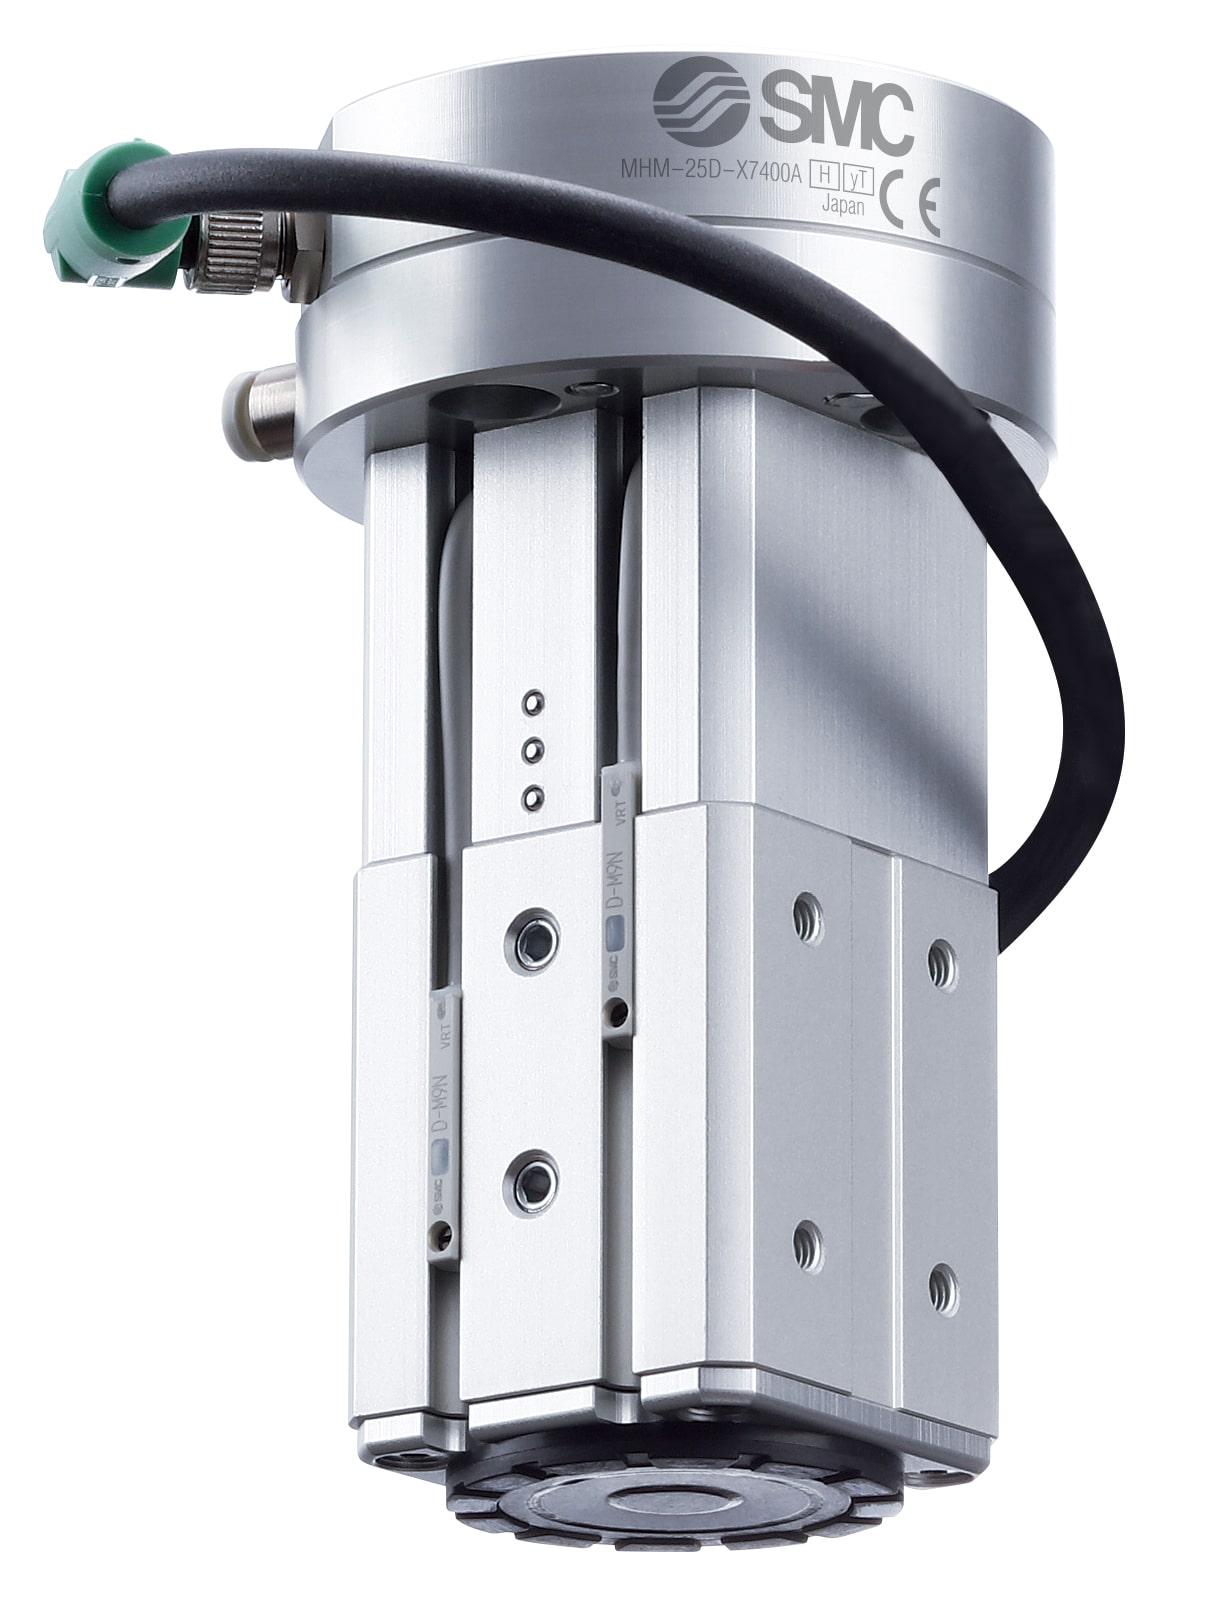 SMC Gripper for CRX Cobot